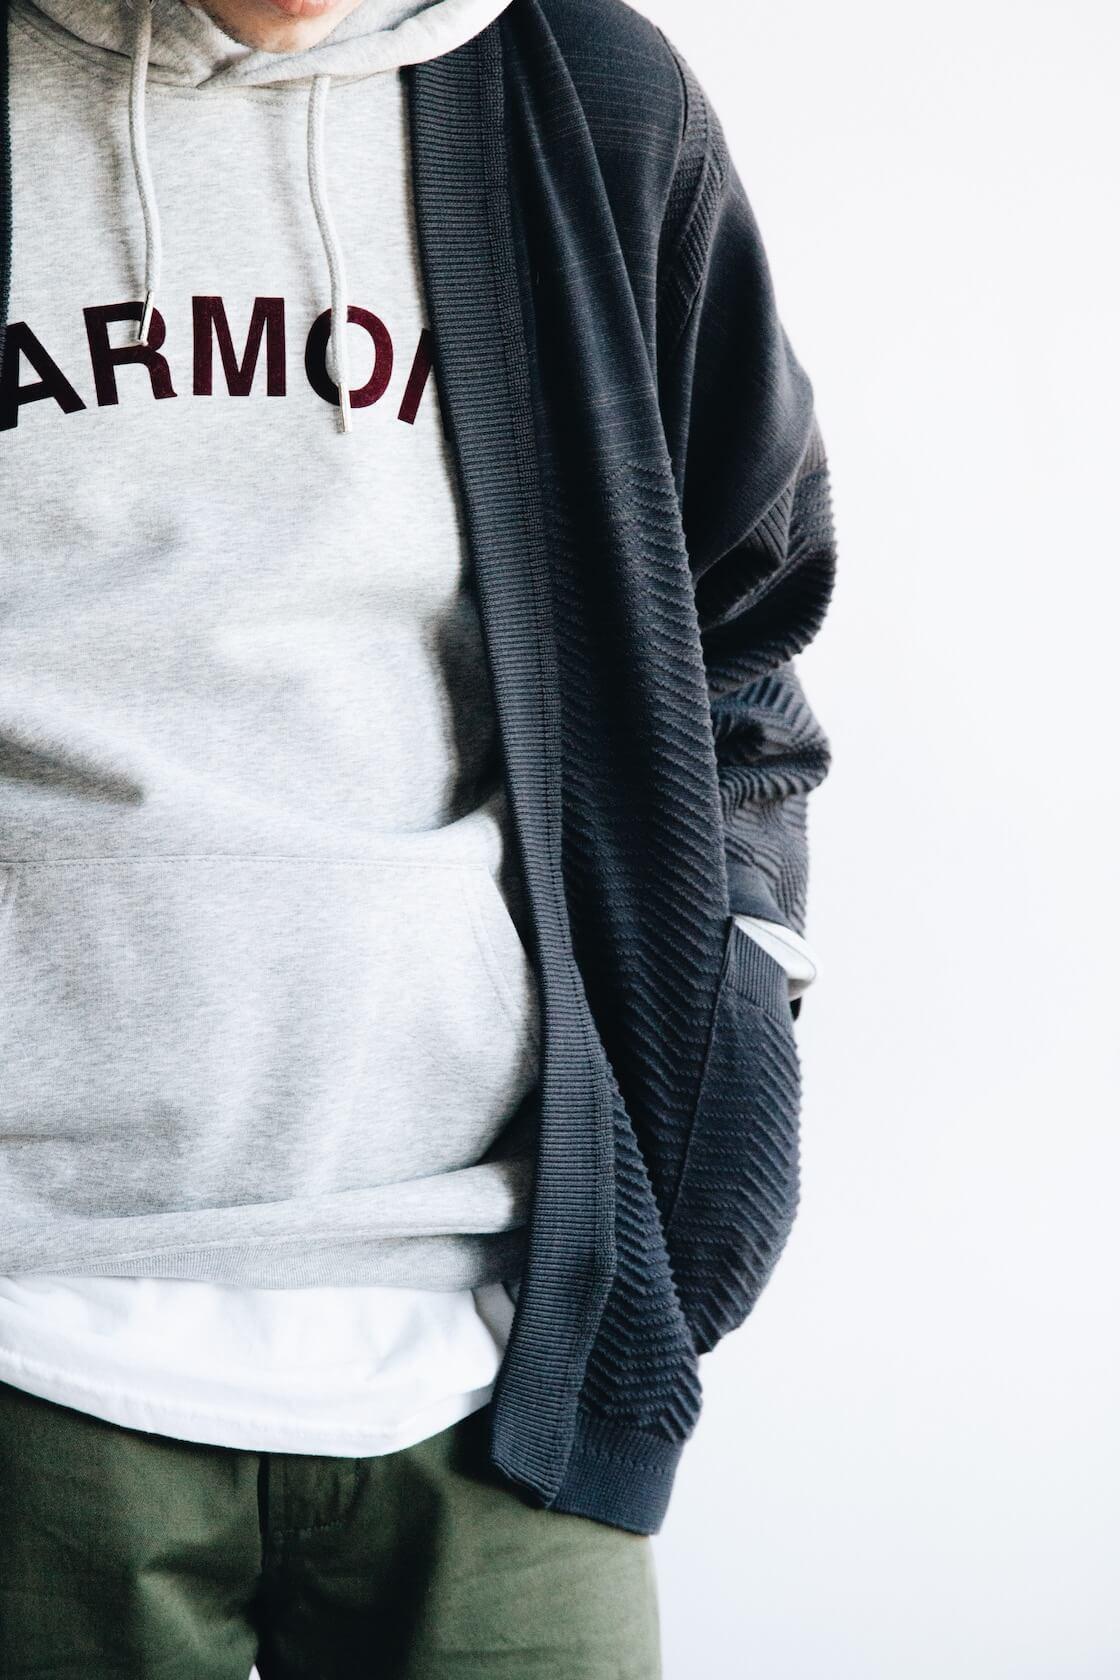 Shunto Hanten Knit from Yashiki, Sany Velour Sweatshirt from Harmony Paris, Military Chinos from Universal Works on body